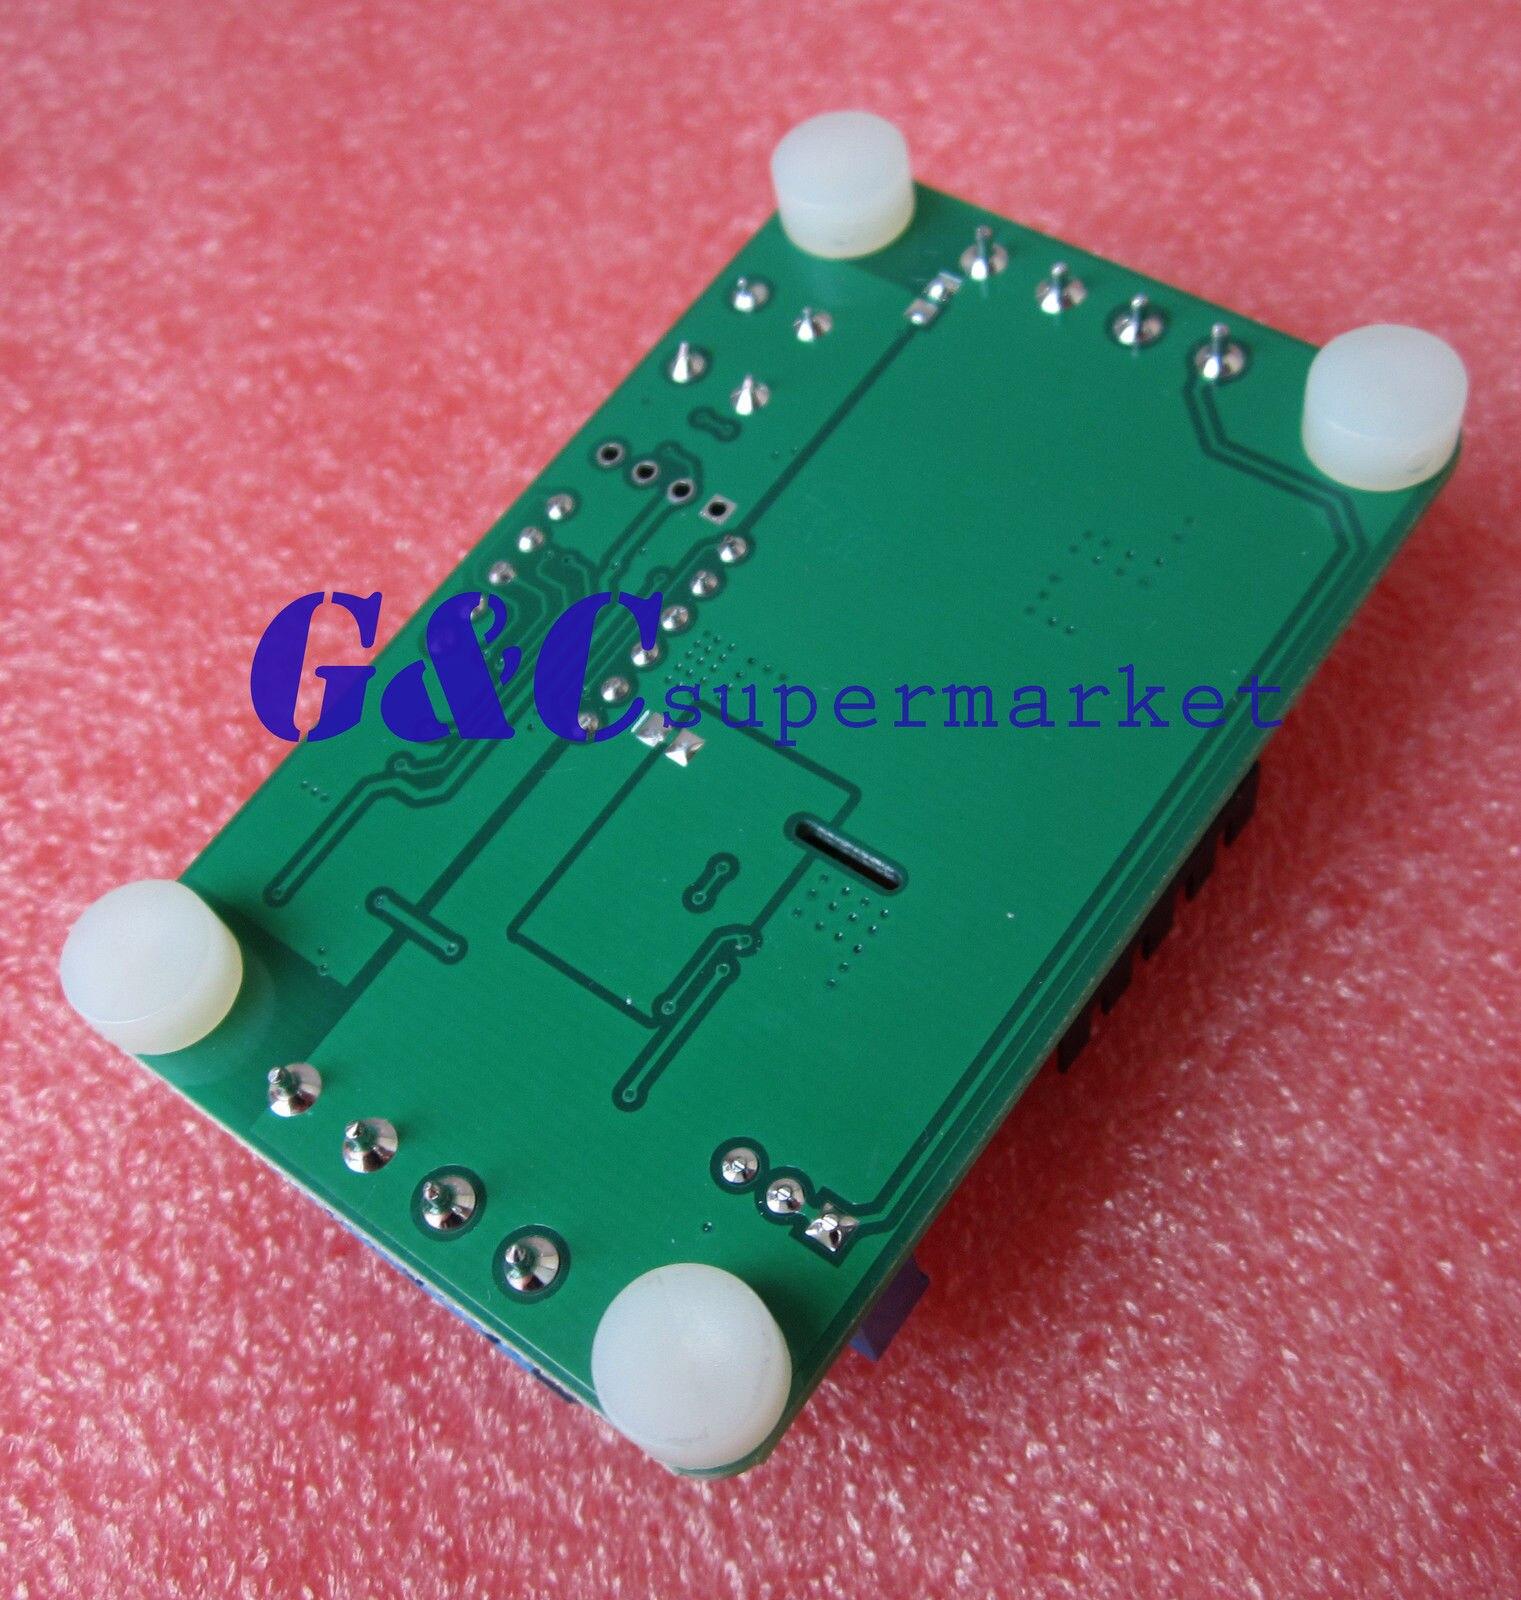 100w 6a Dc Power Source Step Up Converter Ltc1871 35v 30v 5v To 12v Adjustable Converters Red Led Voltmeter In Integrated Circuits From